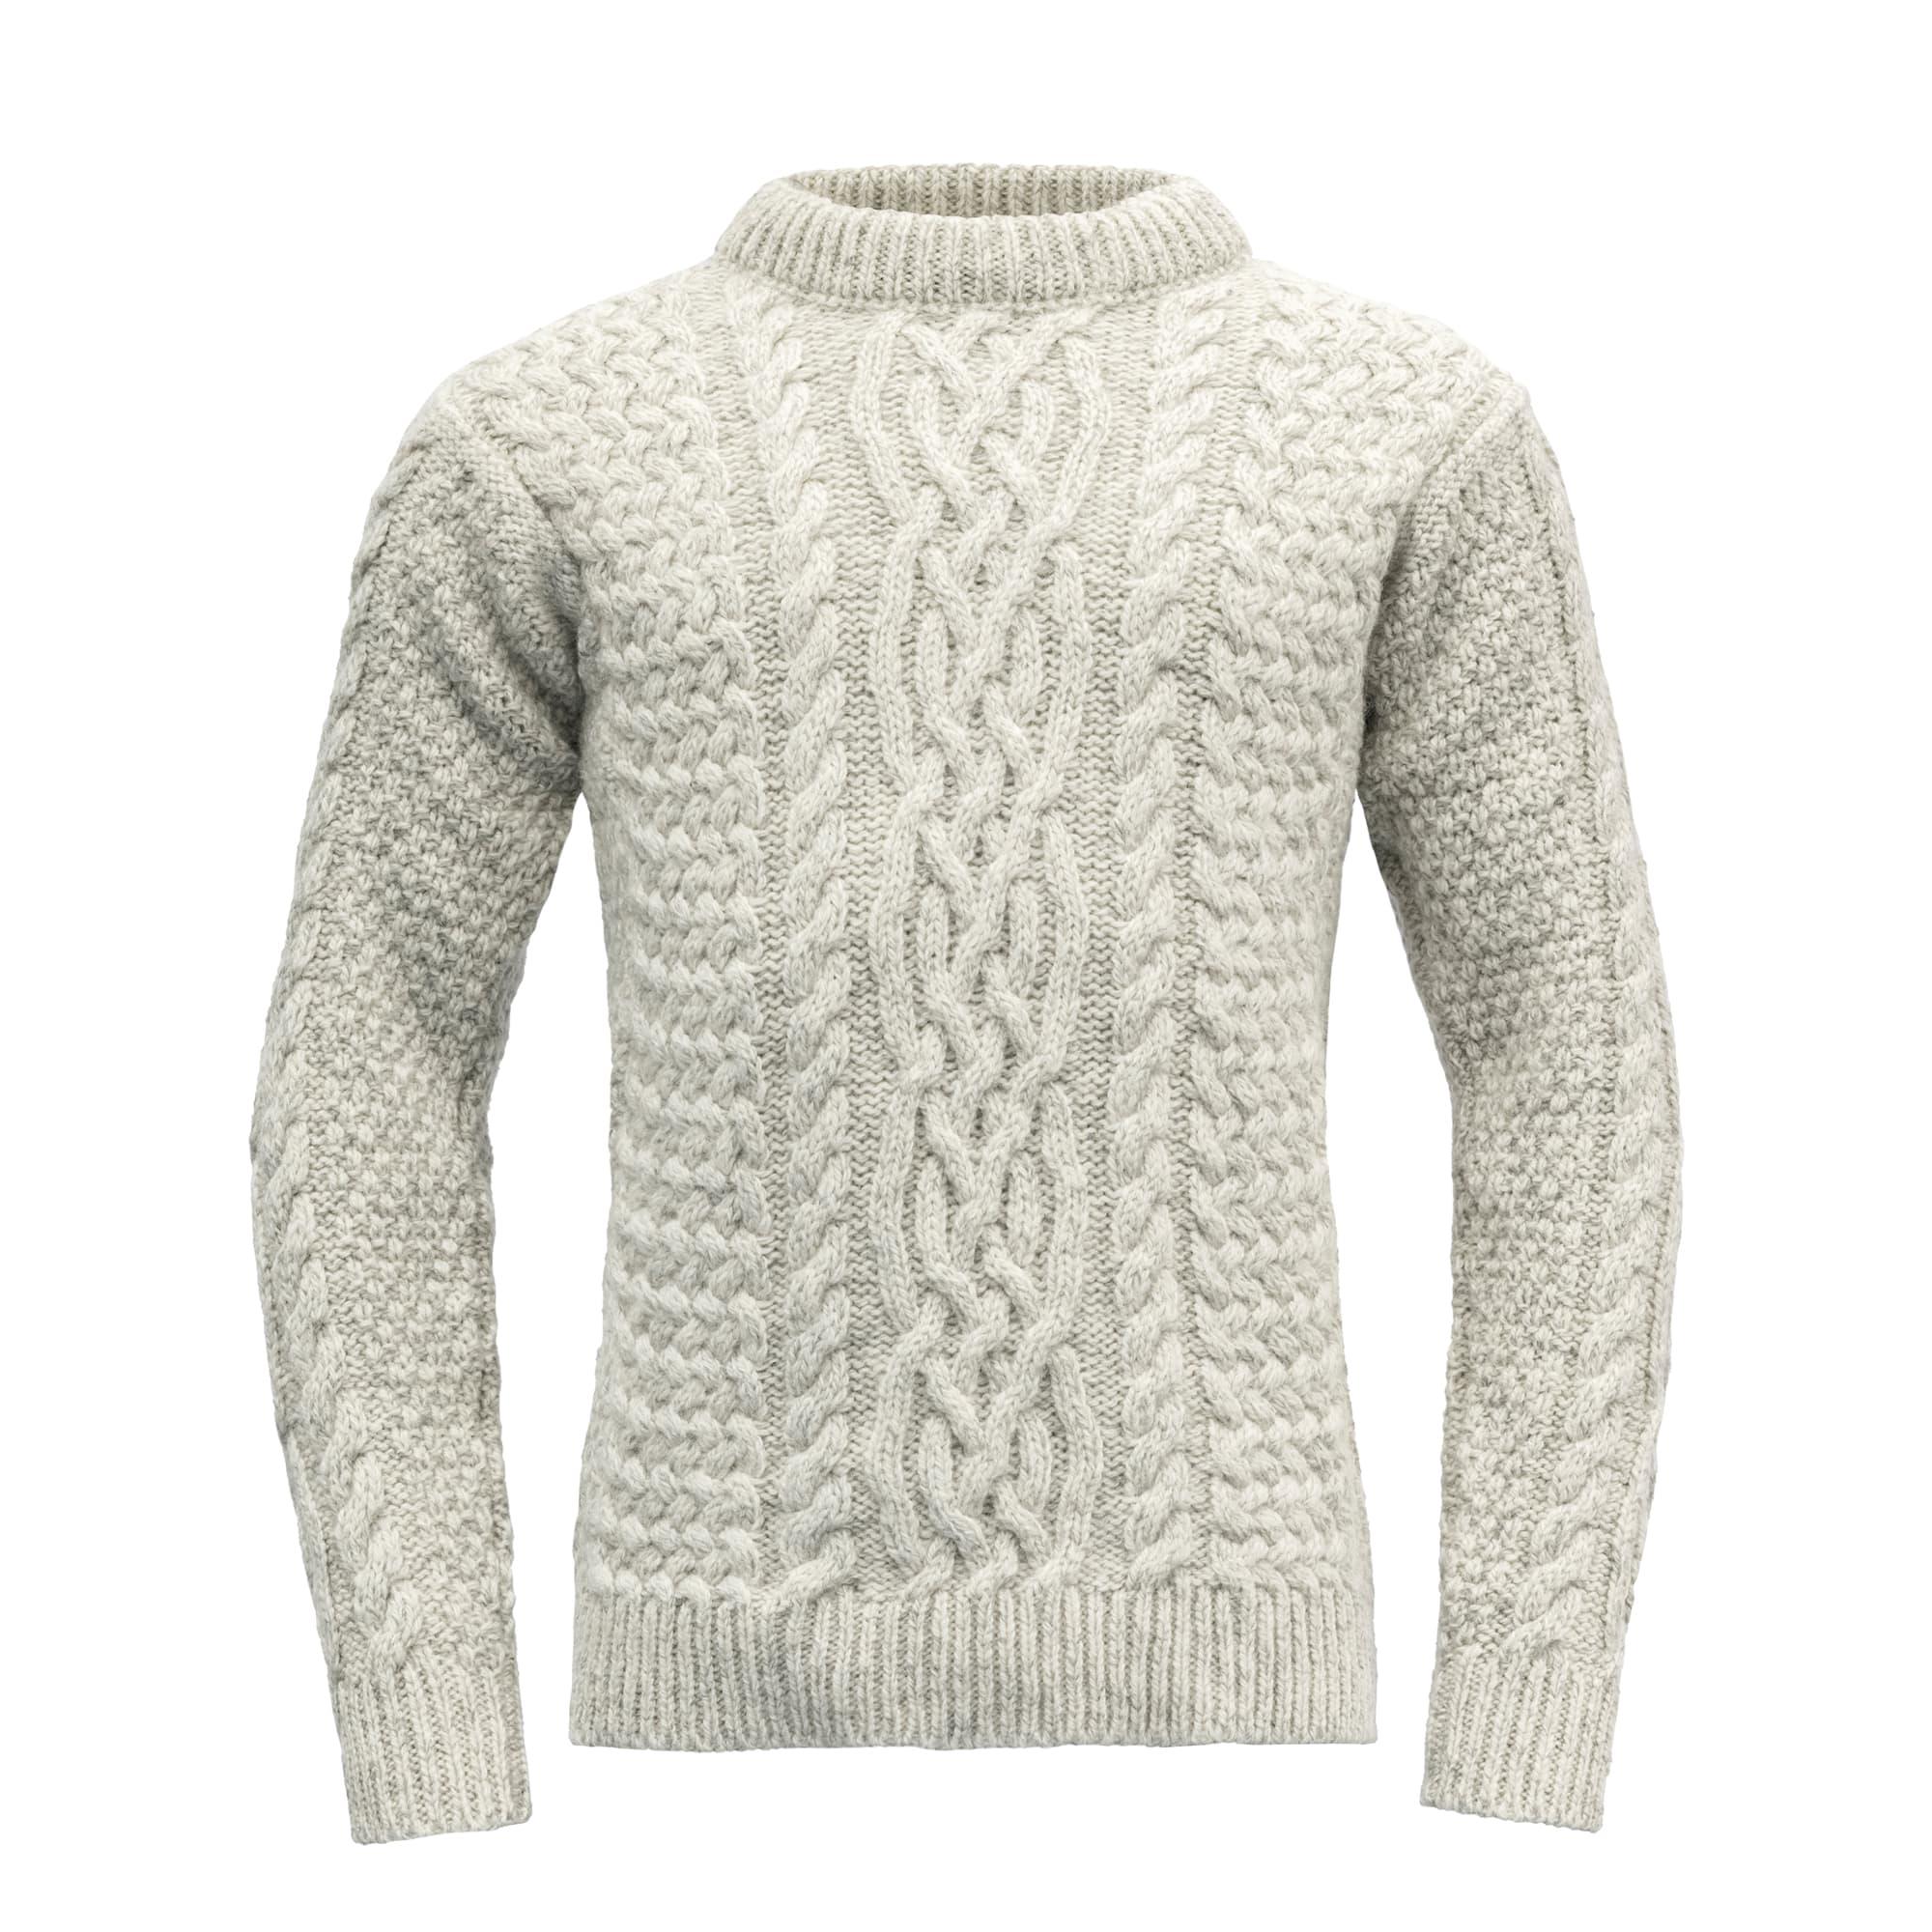 Kjøp Devold Sandøy Sweater Crew Neck fra Outnorth